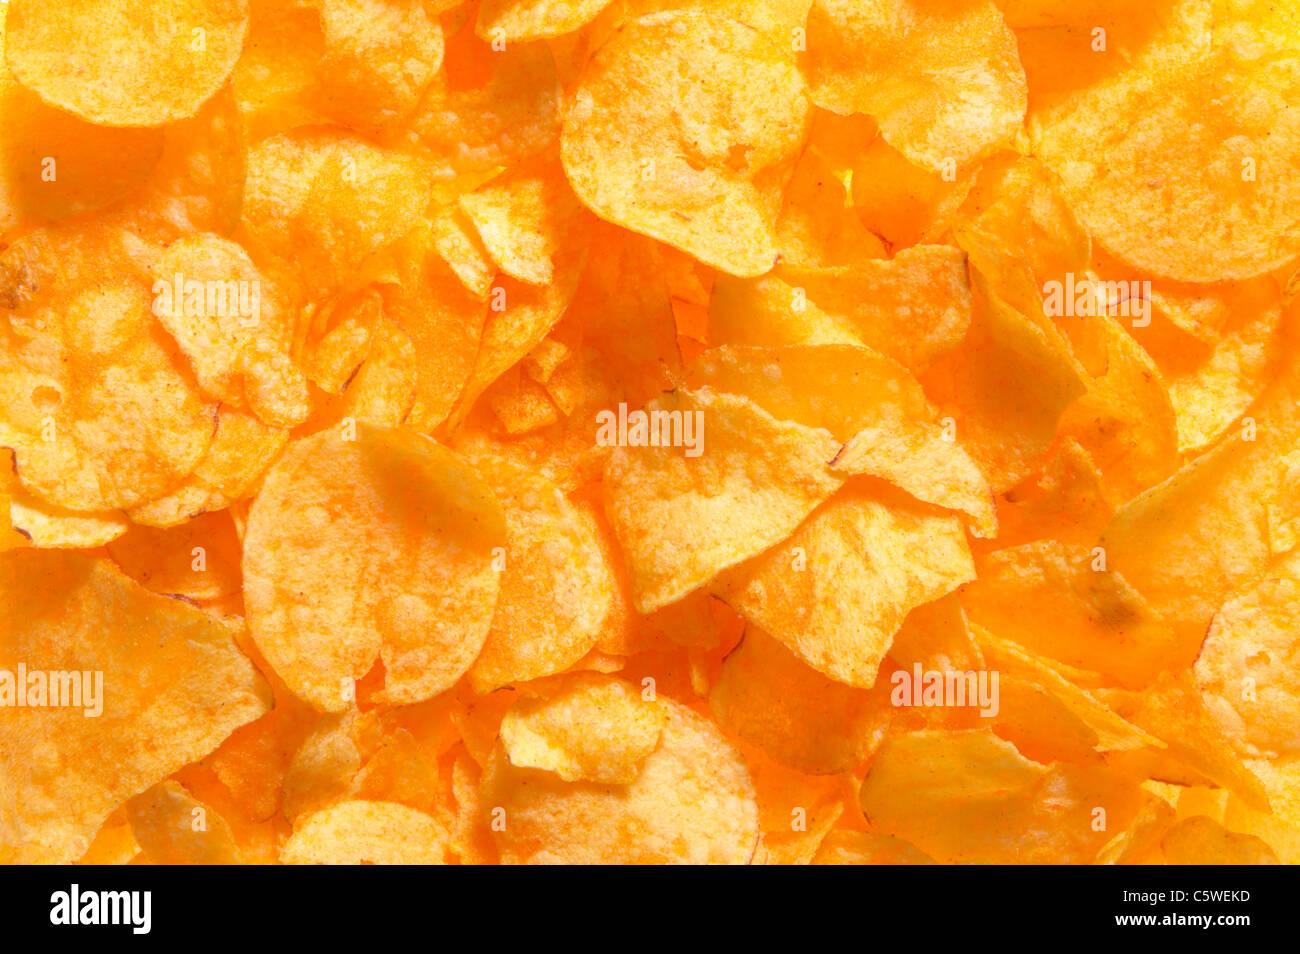 Potato Chips, full frame, close-up Immagini Stock